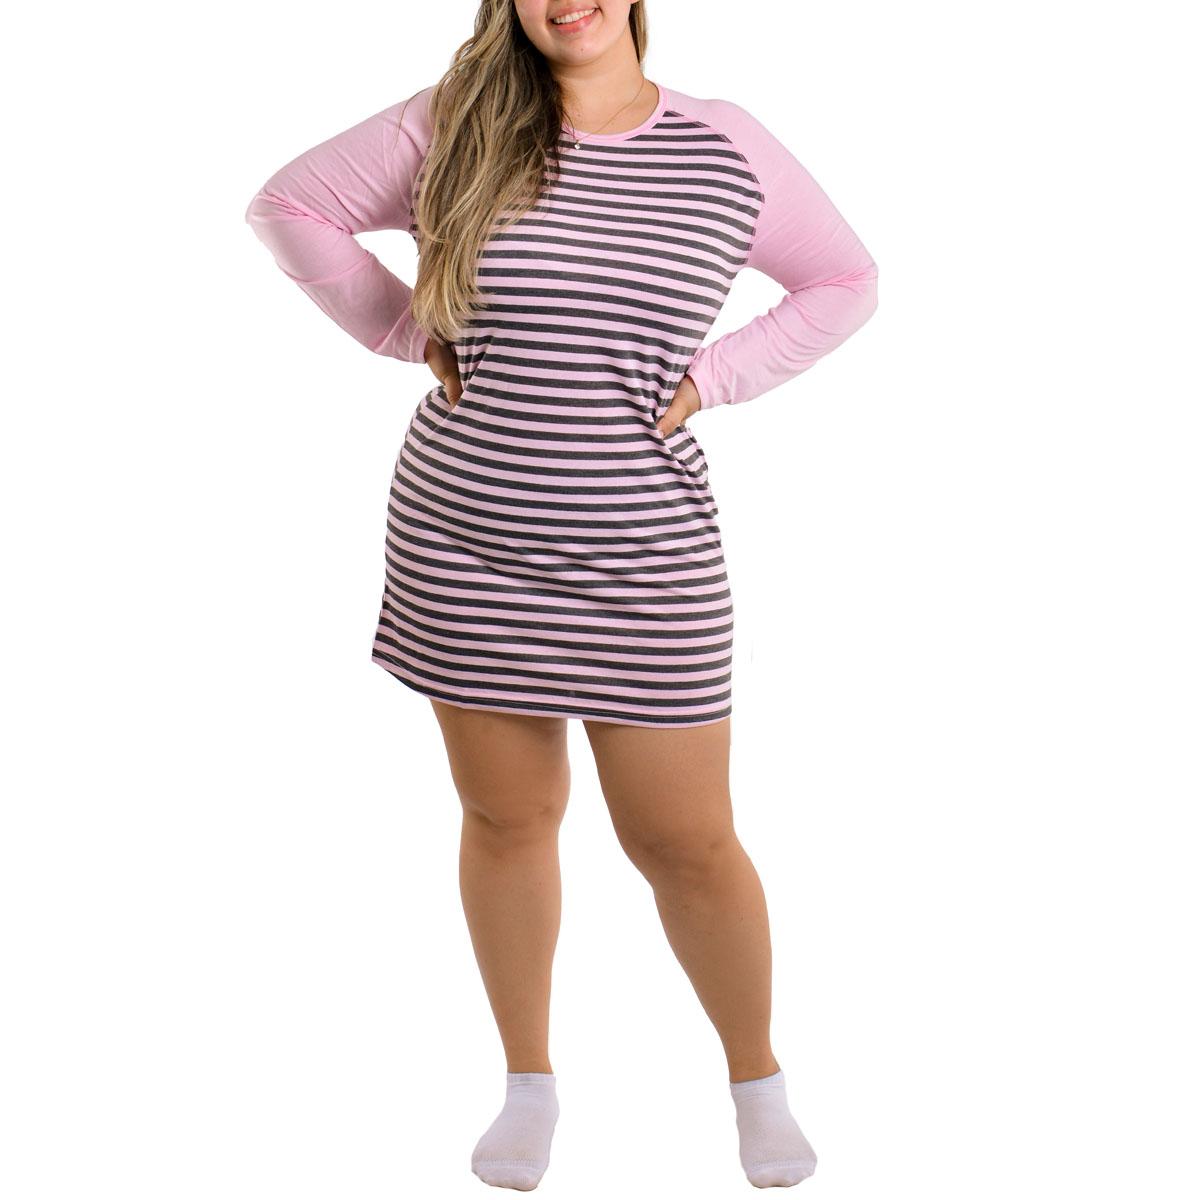 Camisola feminino plus size para o inverno LISTRADA Victory